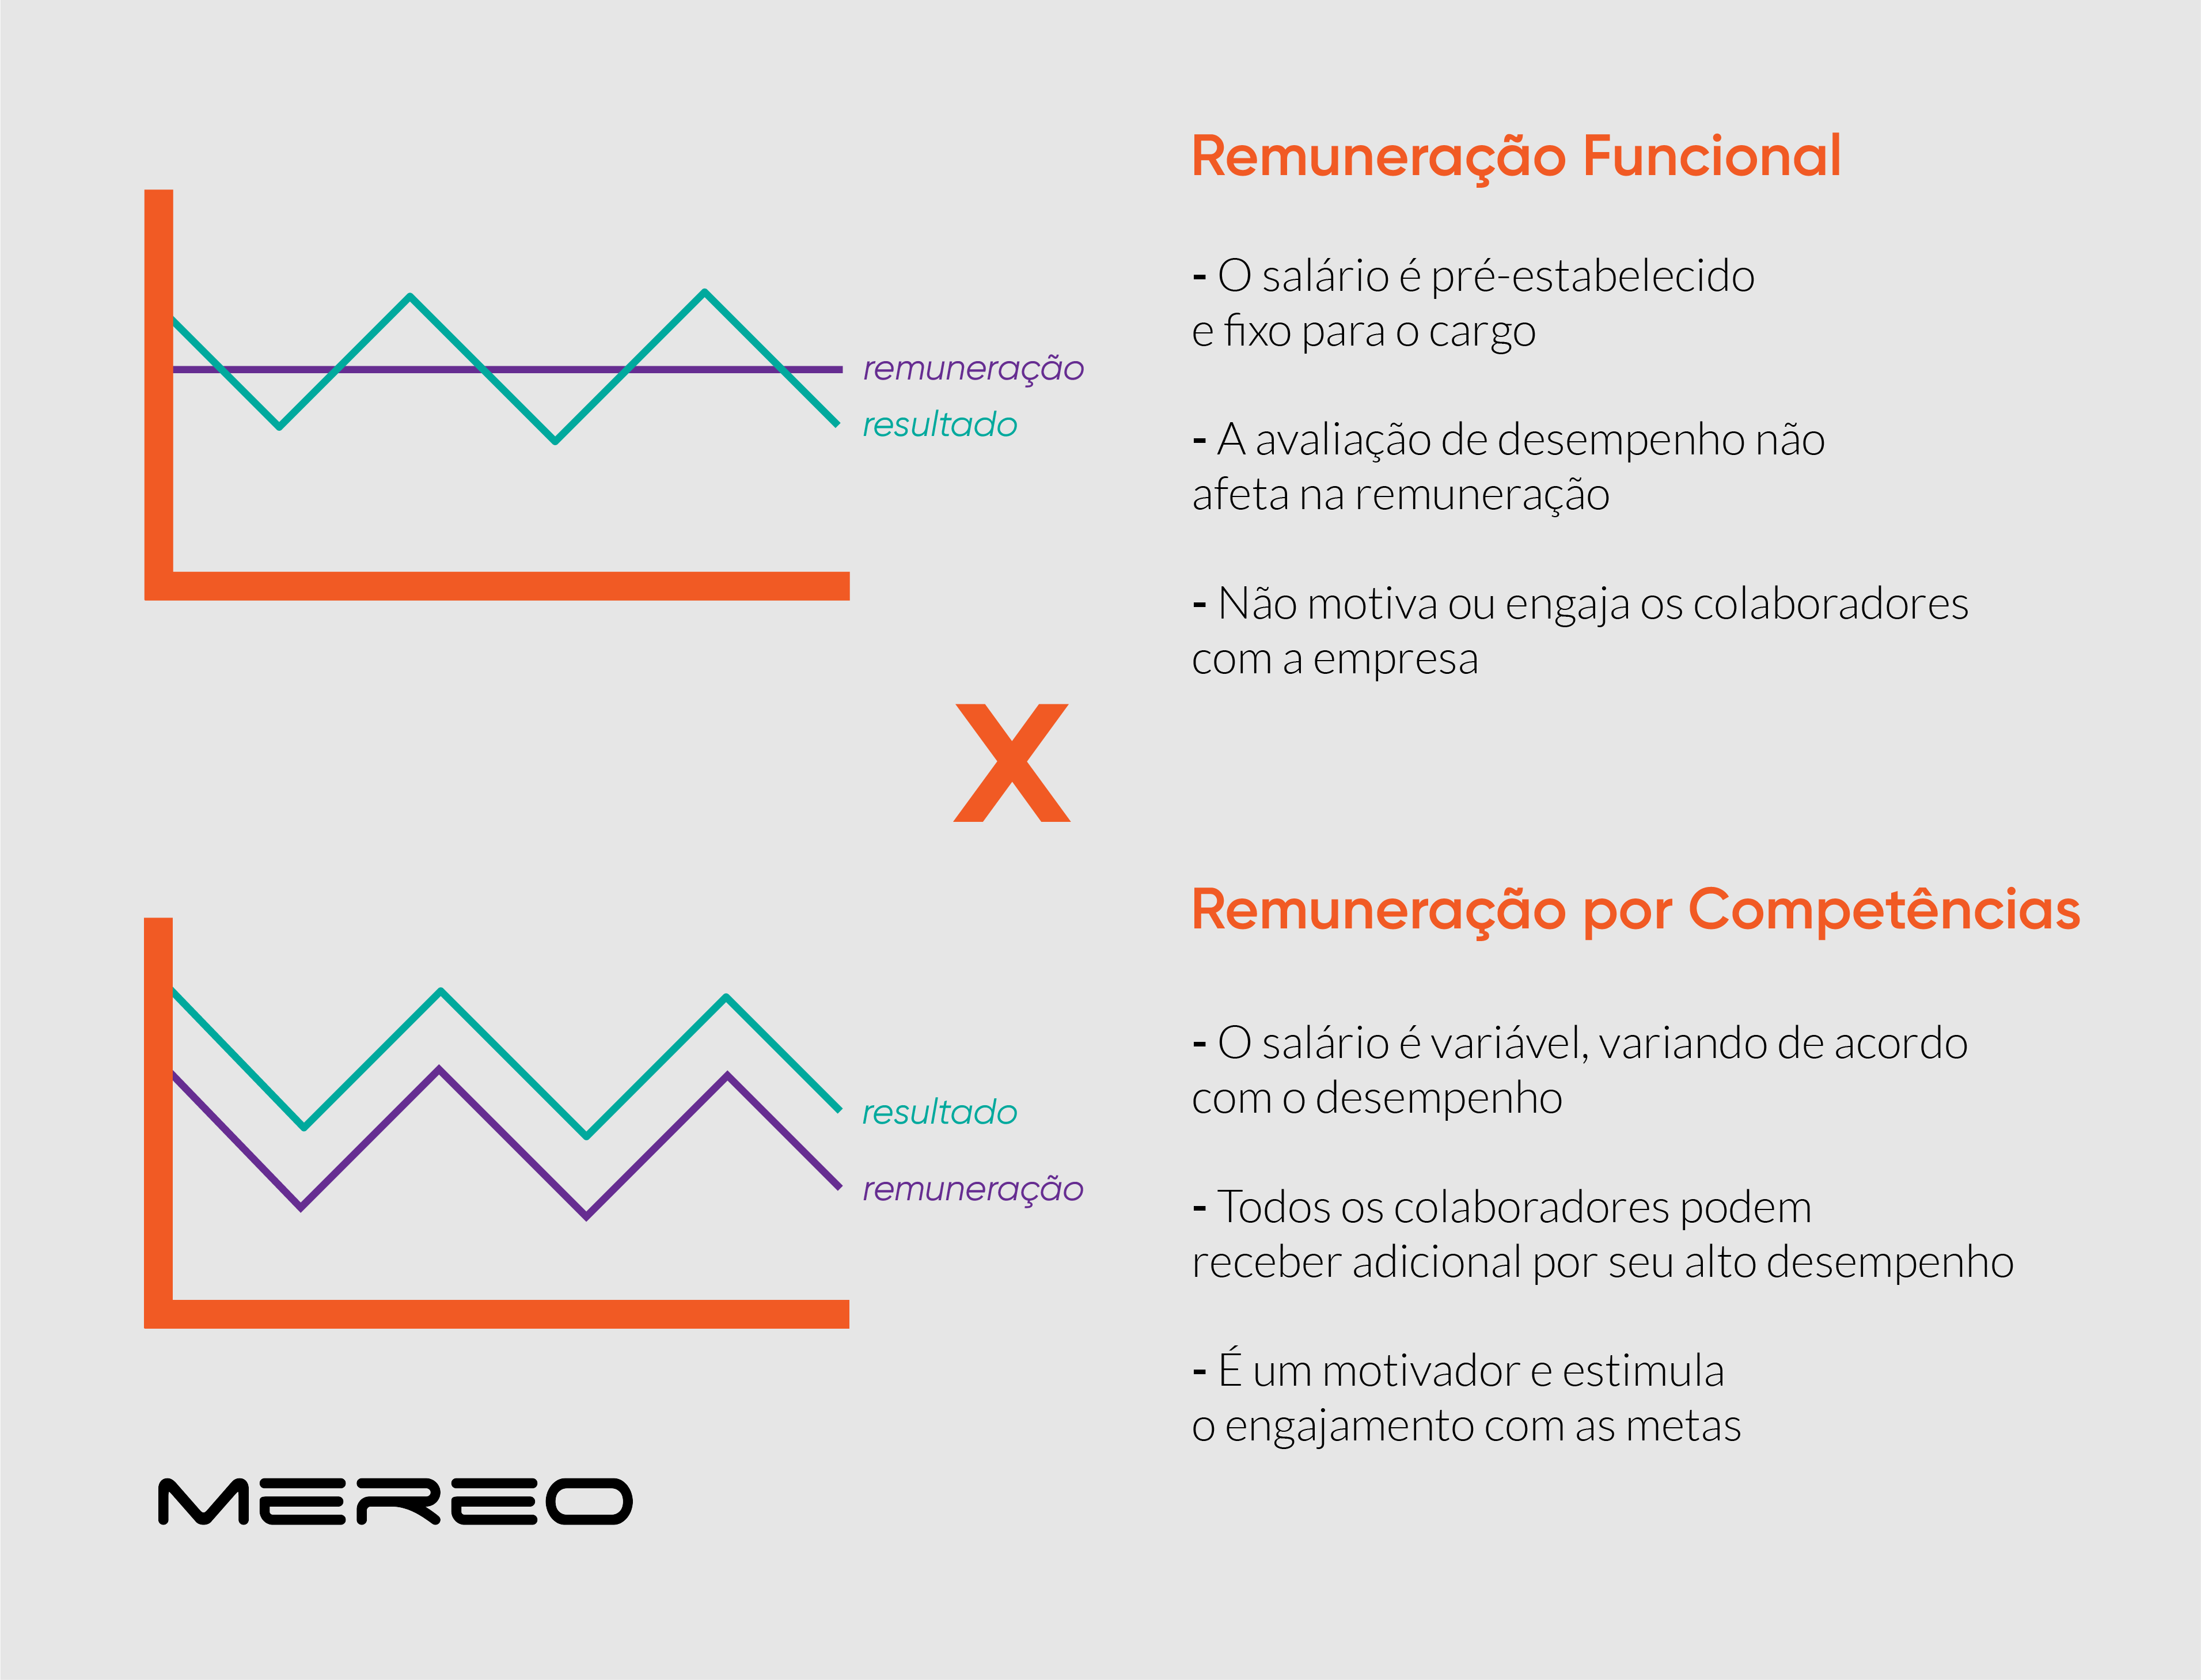 remuneracao_tradicional_remuneracao_por_competencia